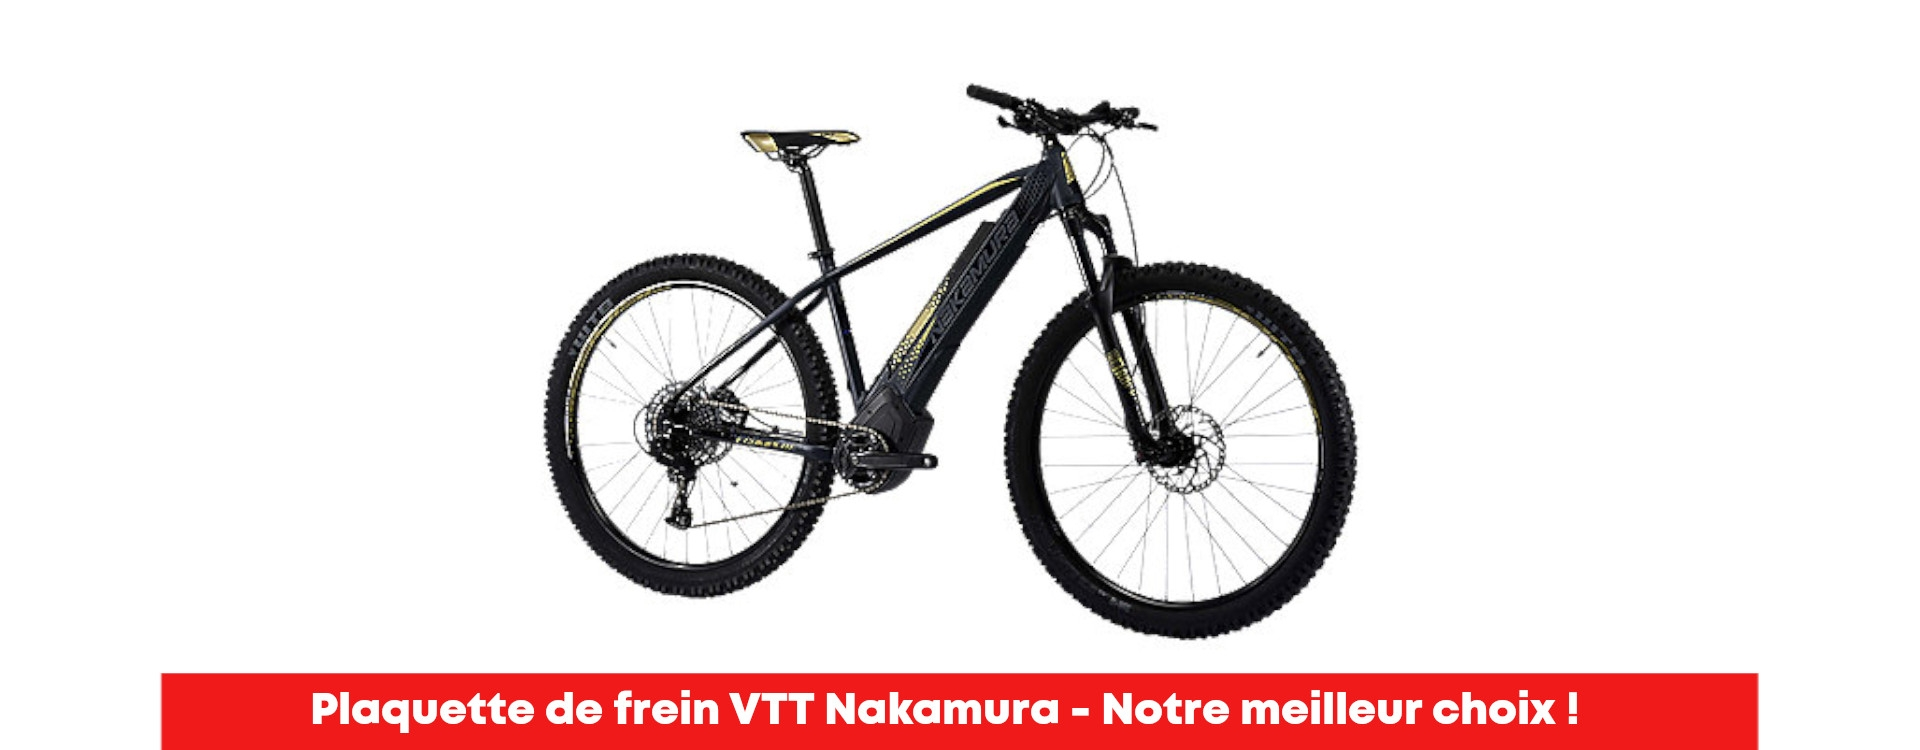 Plaquette de freins VTT Nakamura Intersport, notre meilleur sélection !